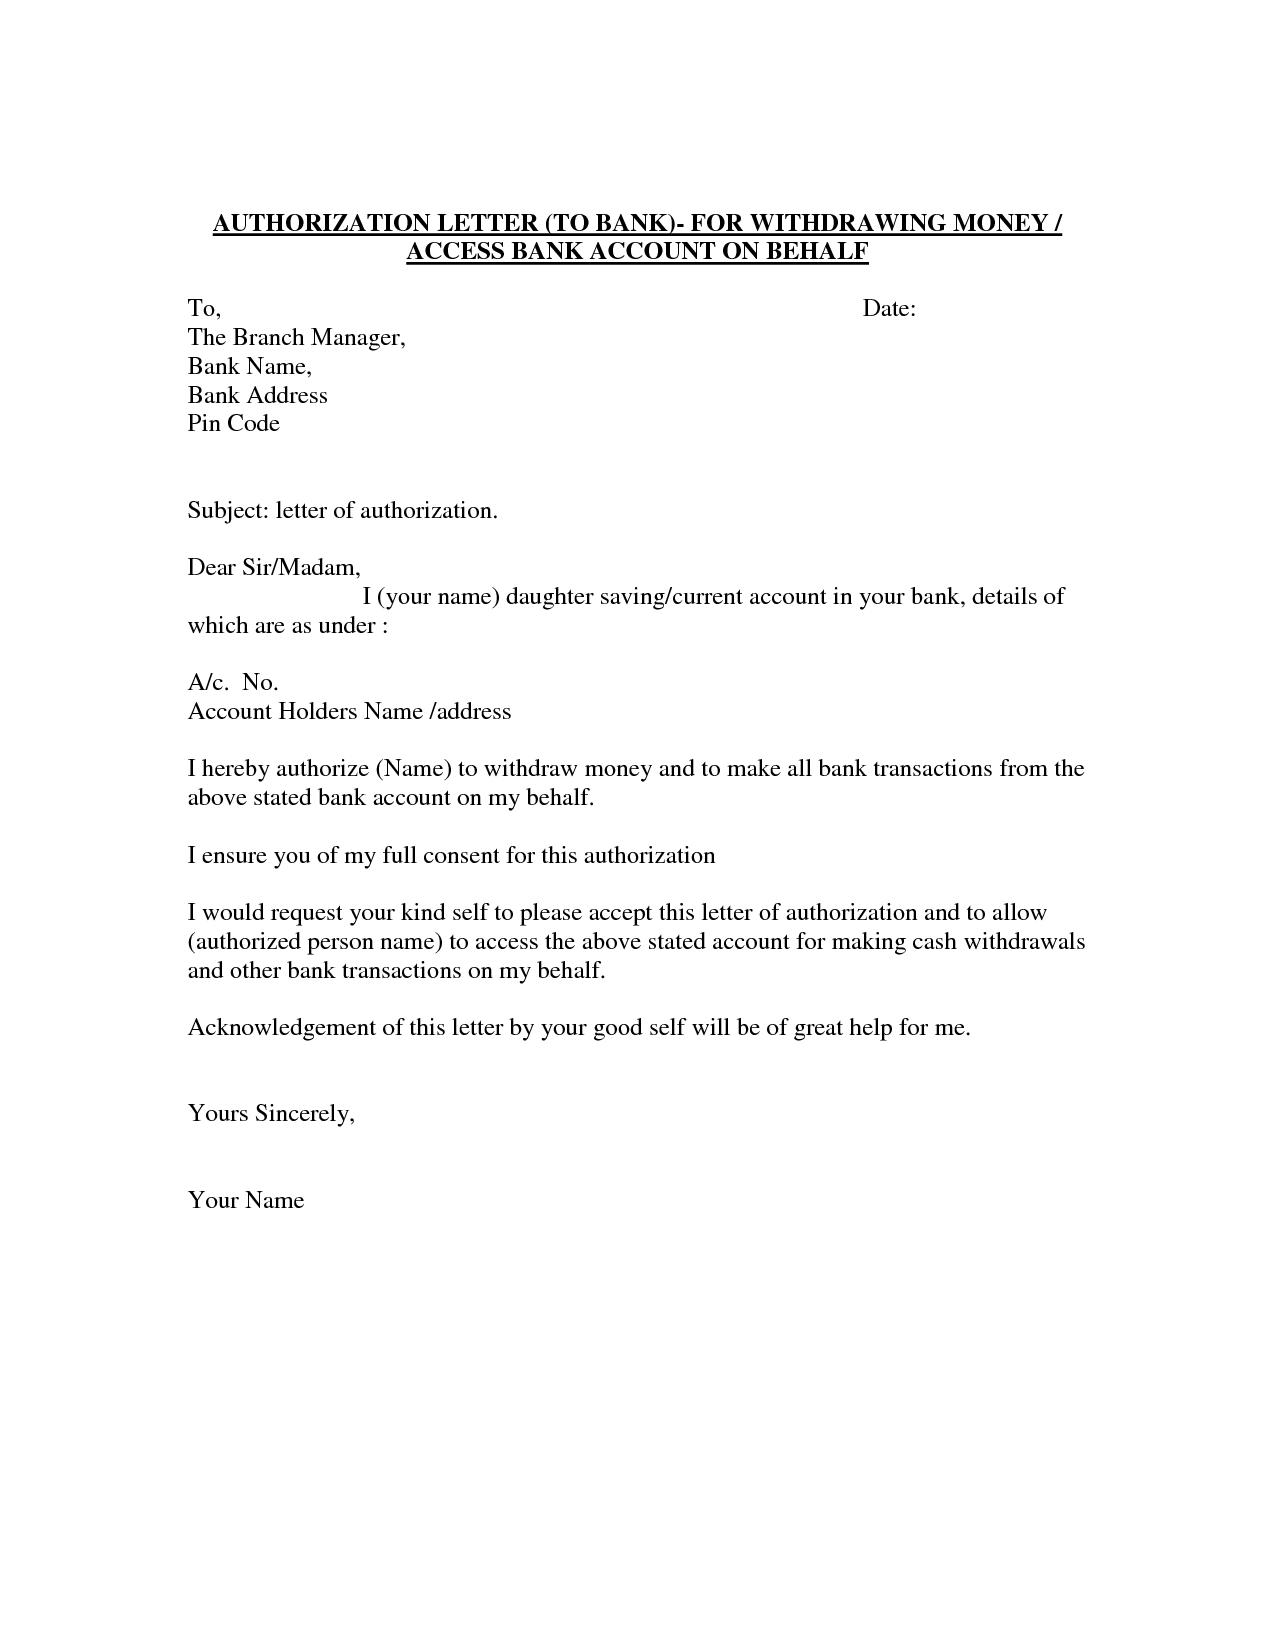 Authorization Letter Template Best Car Galleryformal Letter Authorization Letter  Sample Bank Transaction